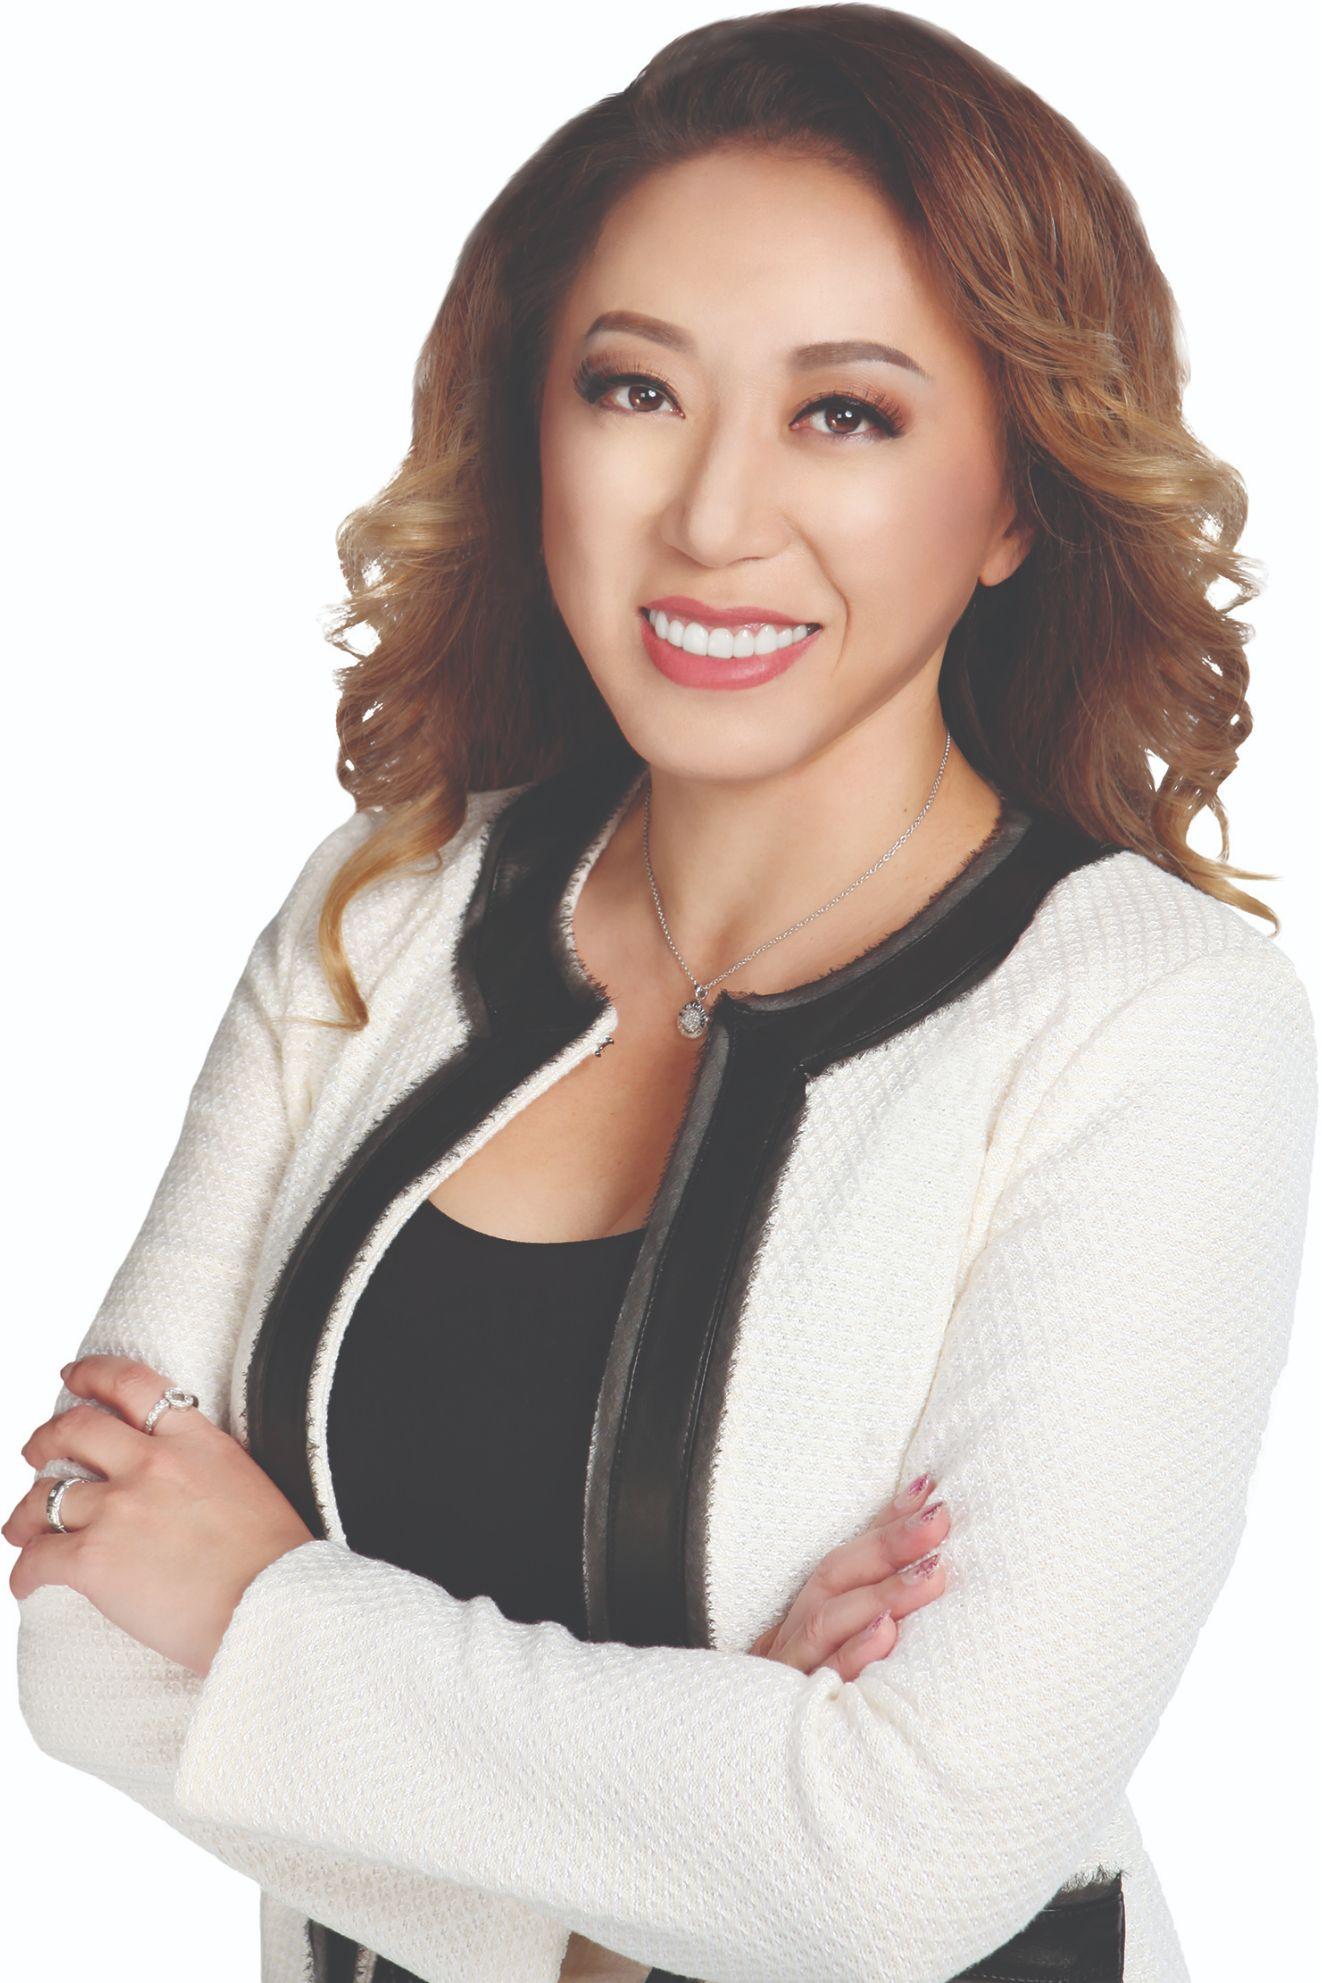 Murray Macy, Real Estate Agent - Yorba Linda, CA